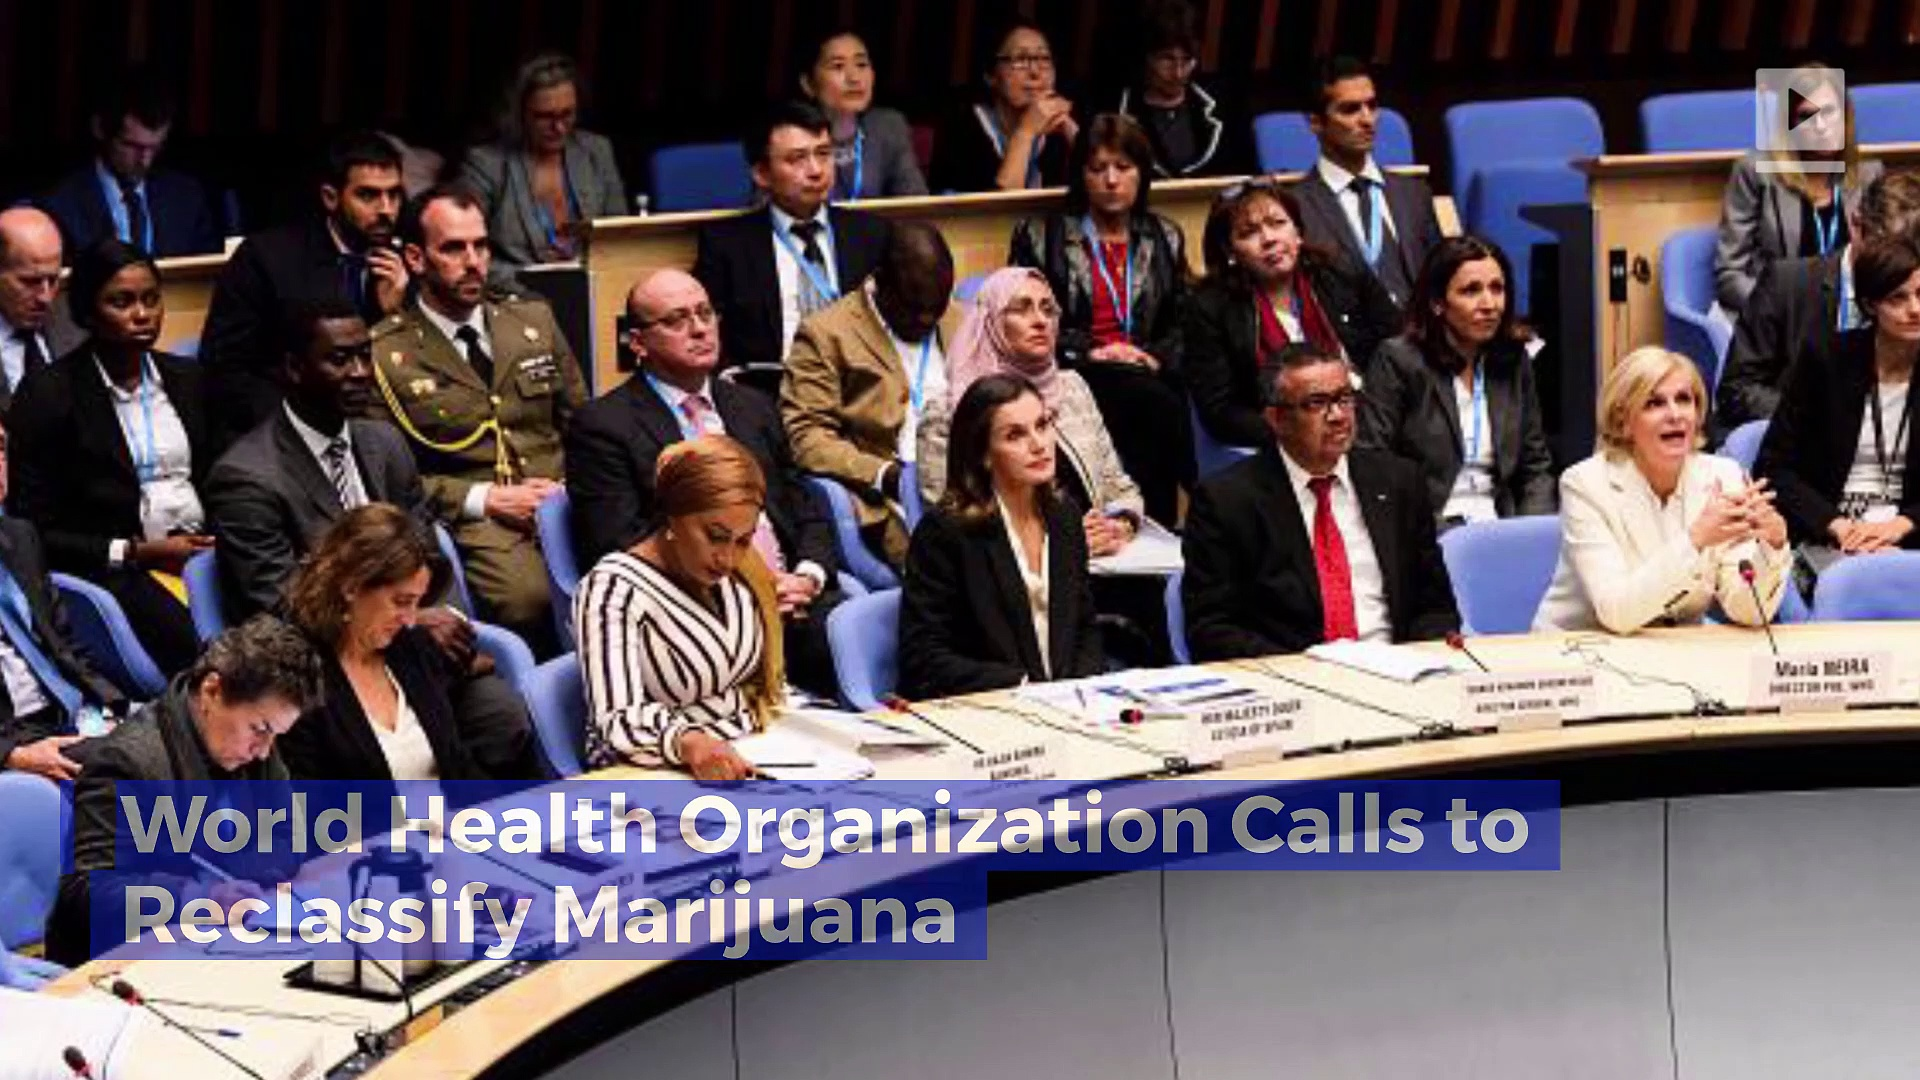 World Health Organization Calls to Reclassify Marijuana